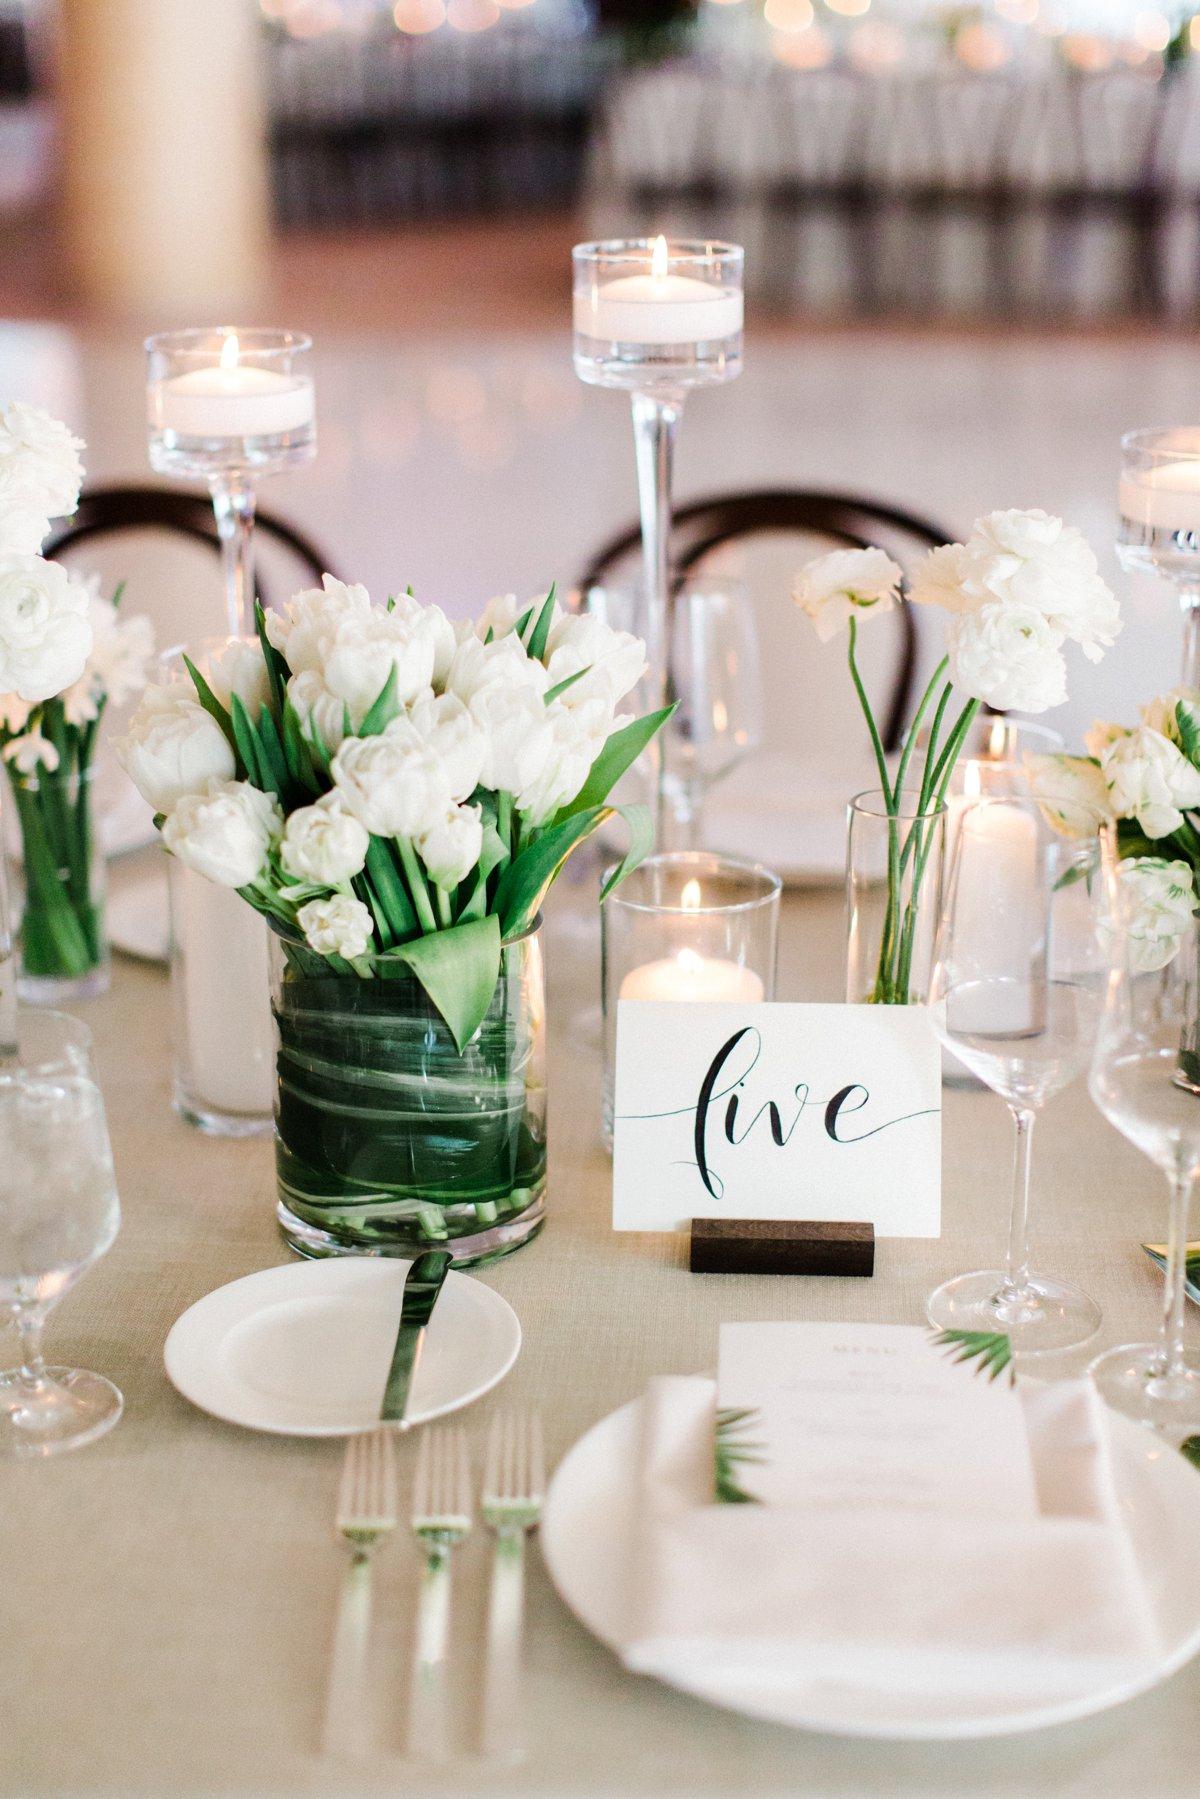 modern wedding receptions - photo by Anna Delores http://ruffledblog.com/chic-modern-wedding-at-four-seasons-santa-barbara